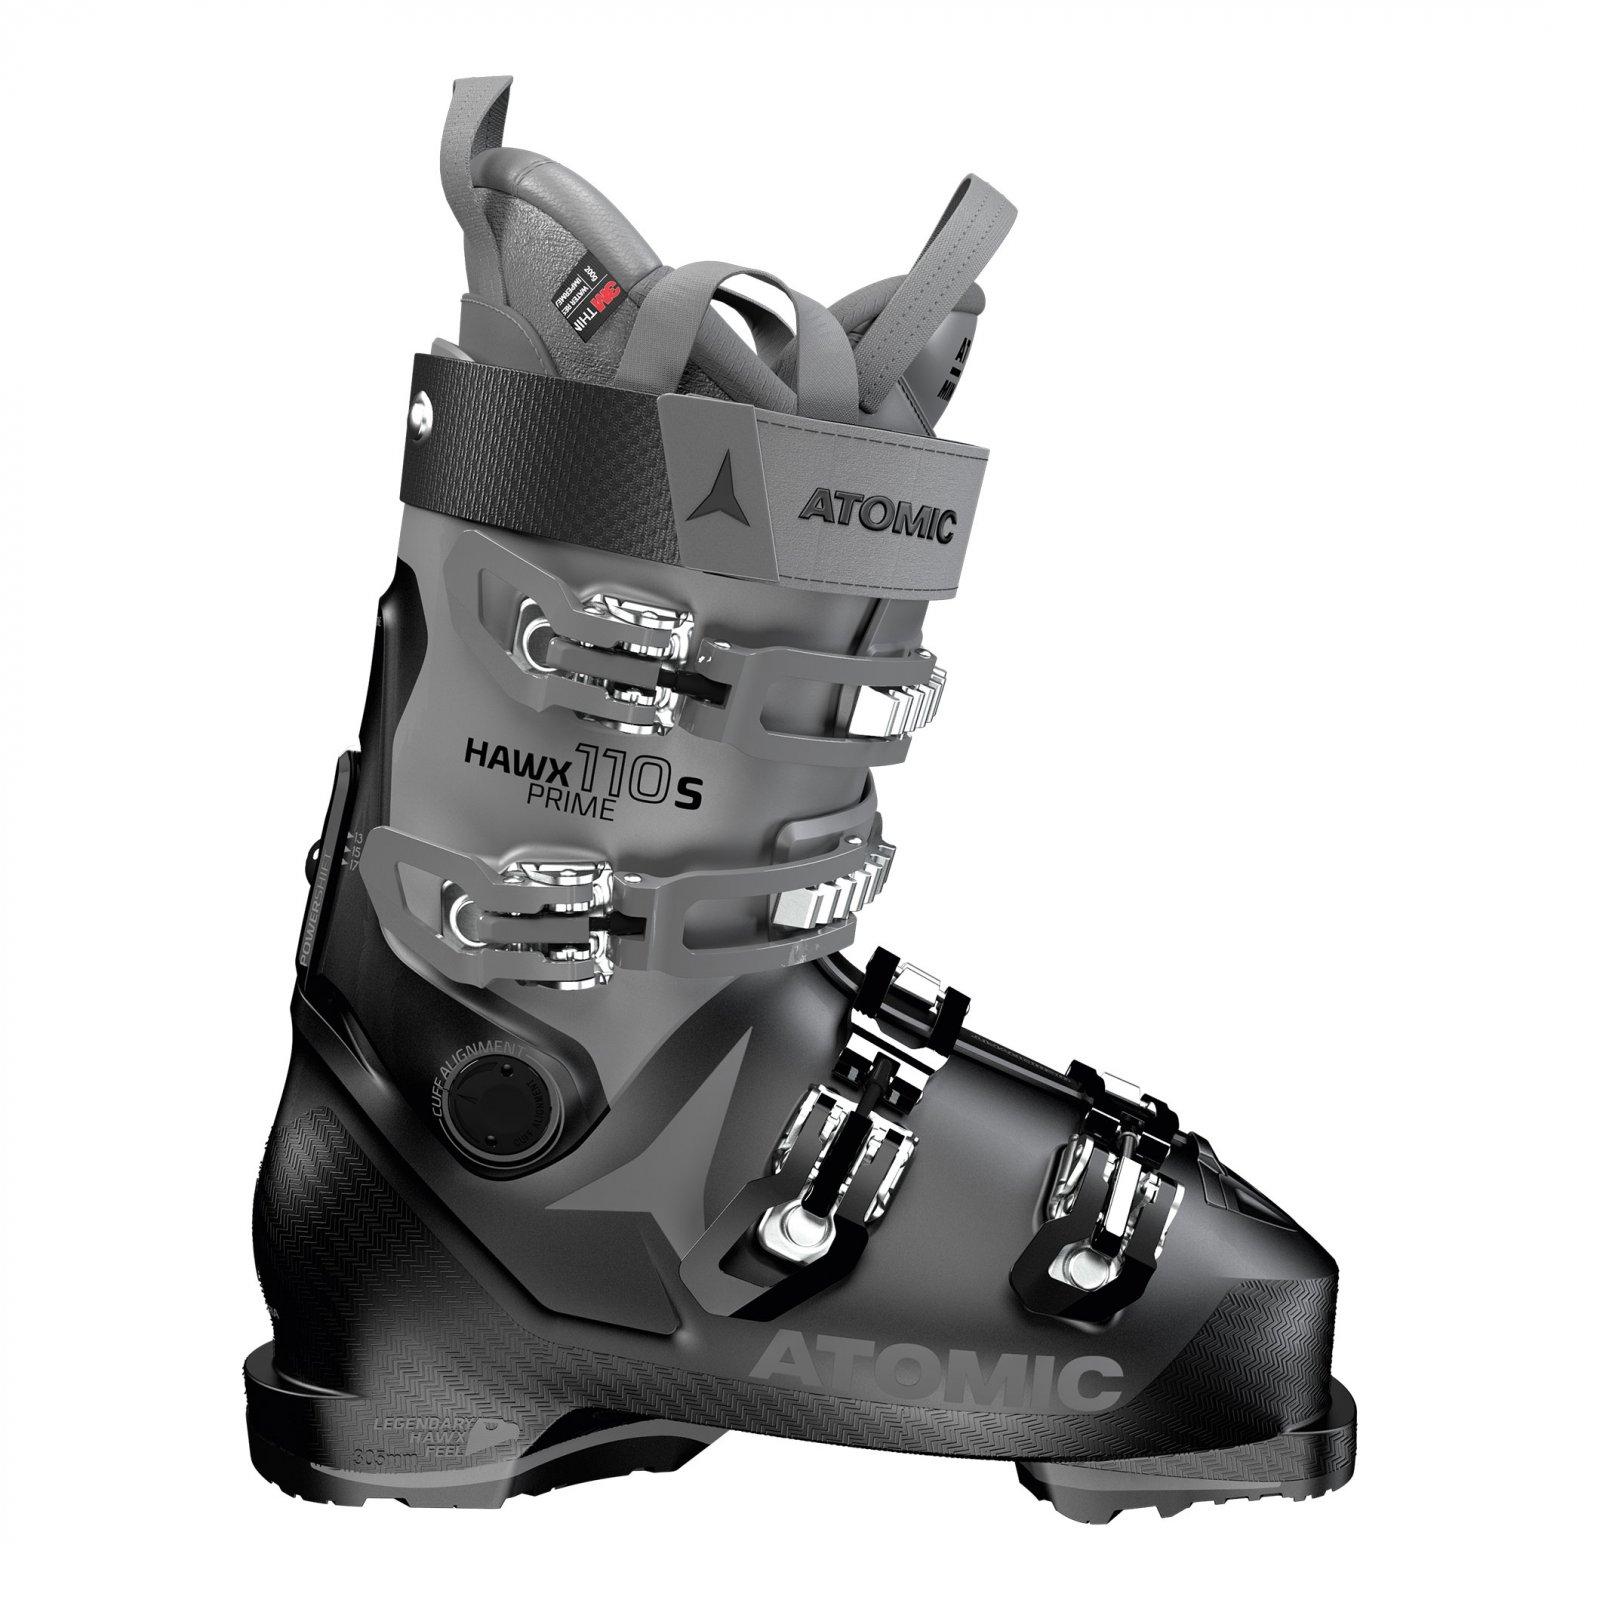 2022 Atomic Hawx Prime 110 Men's Ski Boots